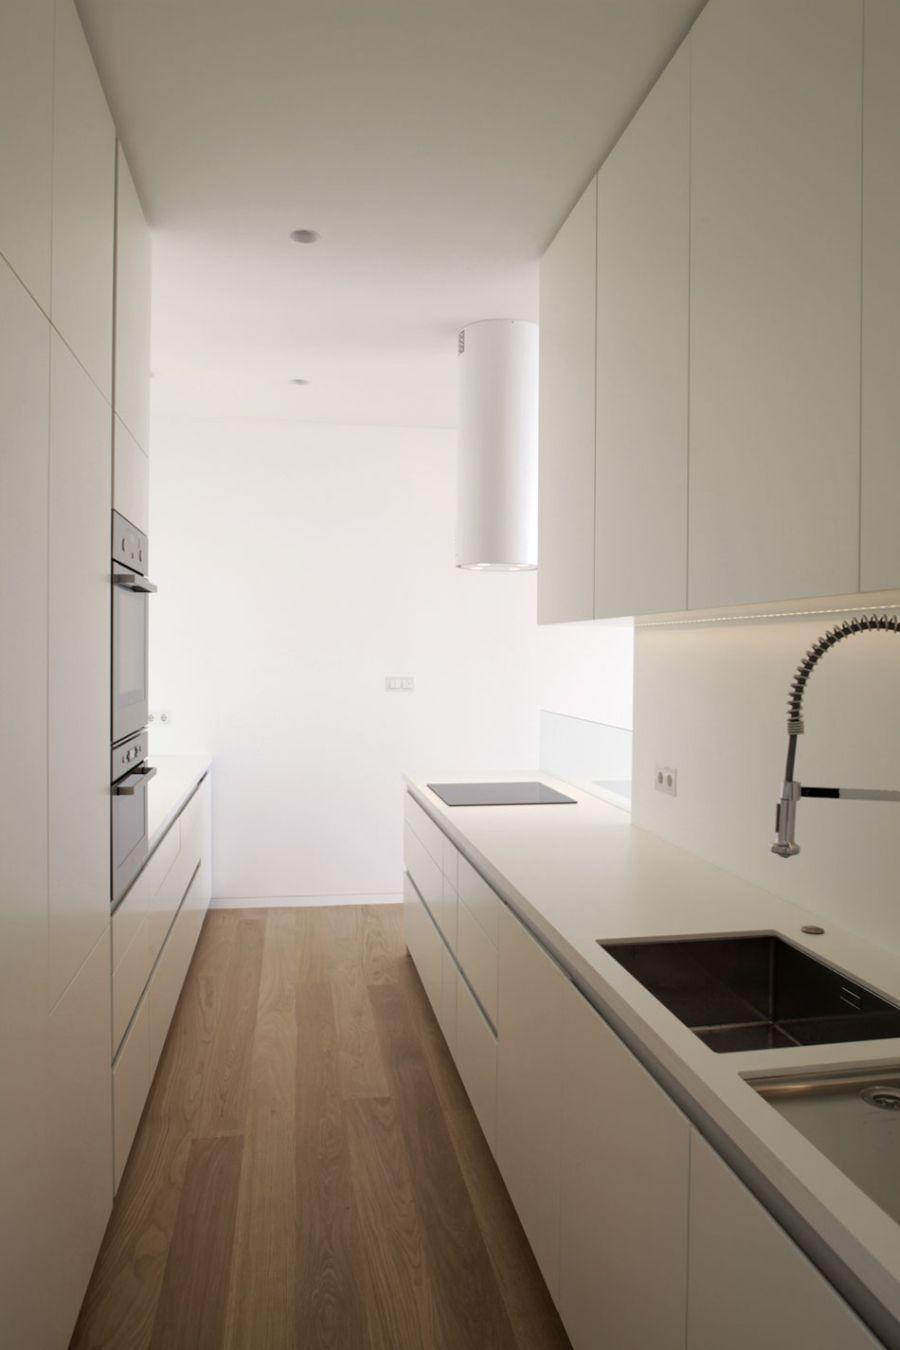 Minimalist House 85 Design: Ingenious House U In Croatia Offers Unabated Views Of The Adriatic Coast